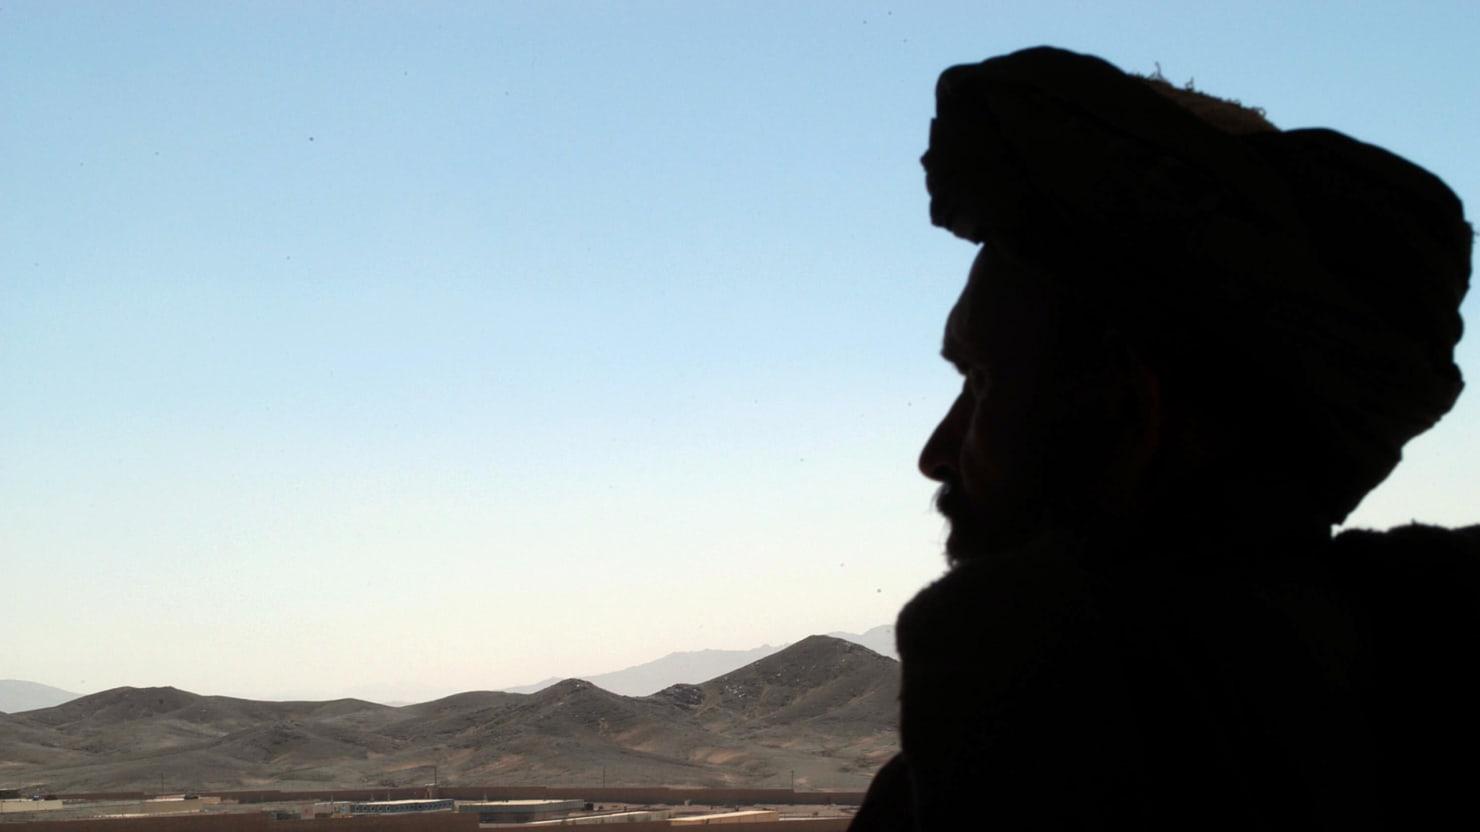 Top Taliban Commander Resigns, Revealing Major Rift in the Leadership